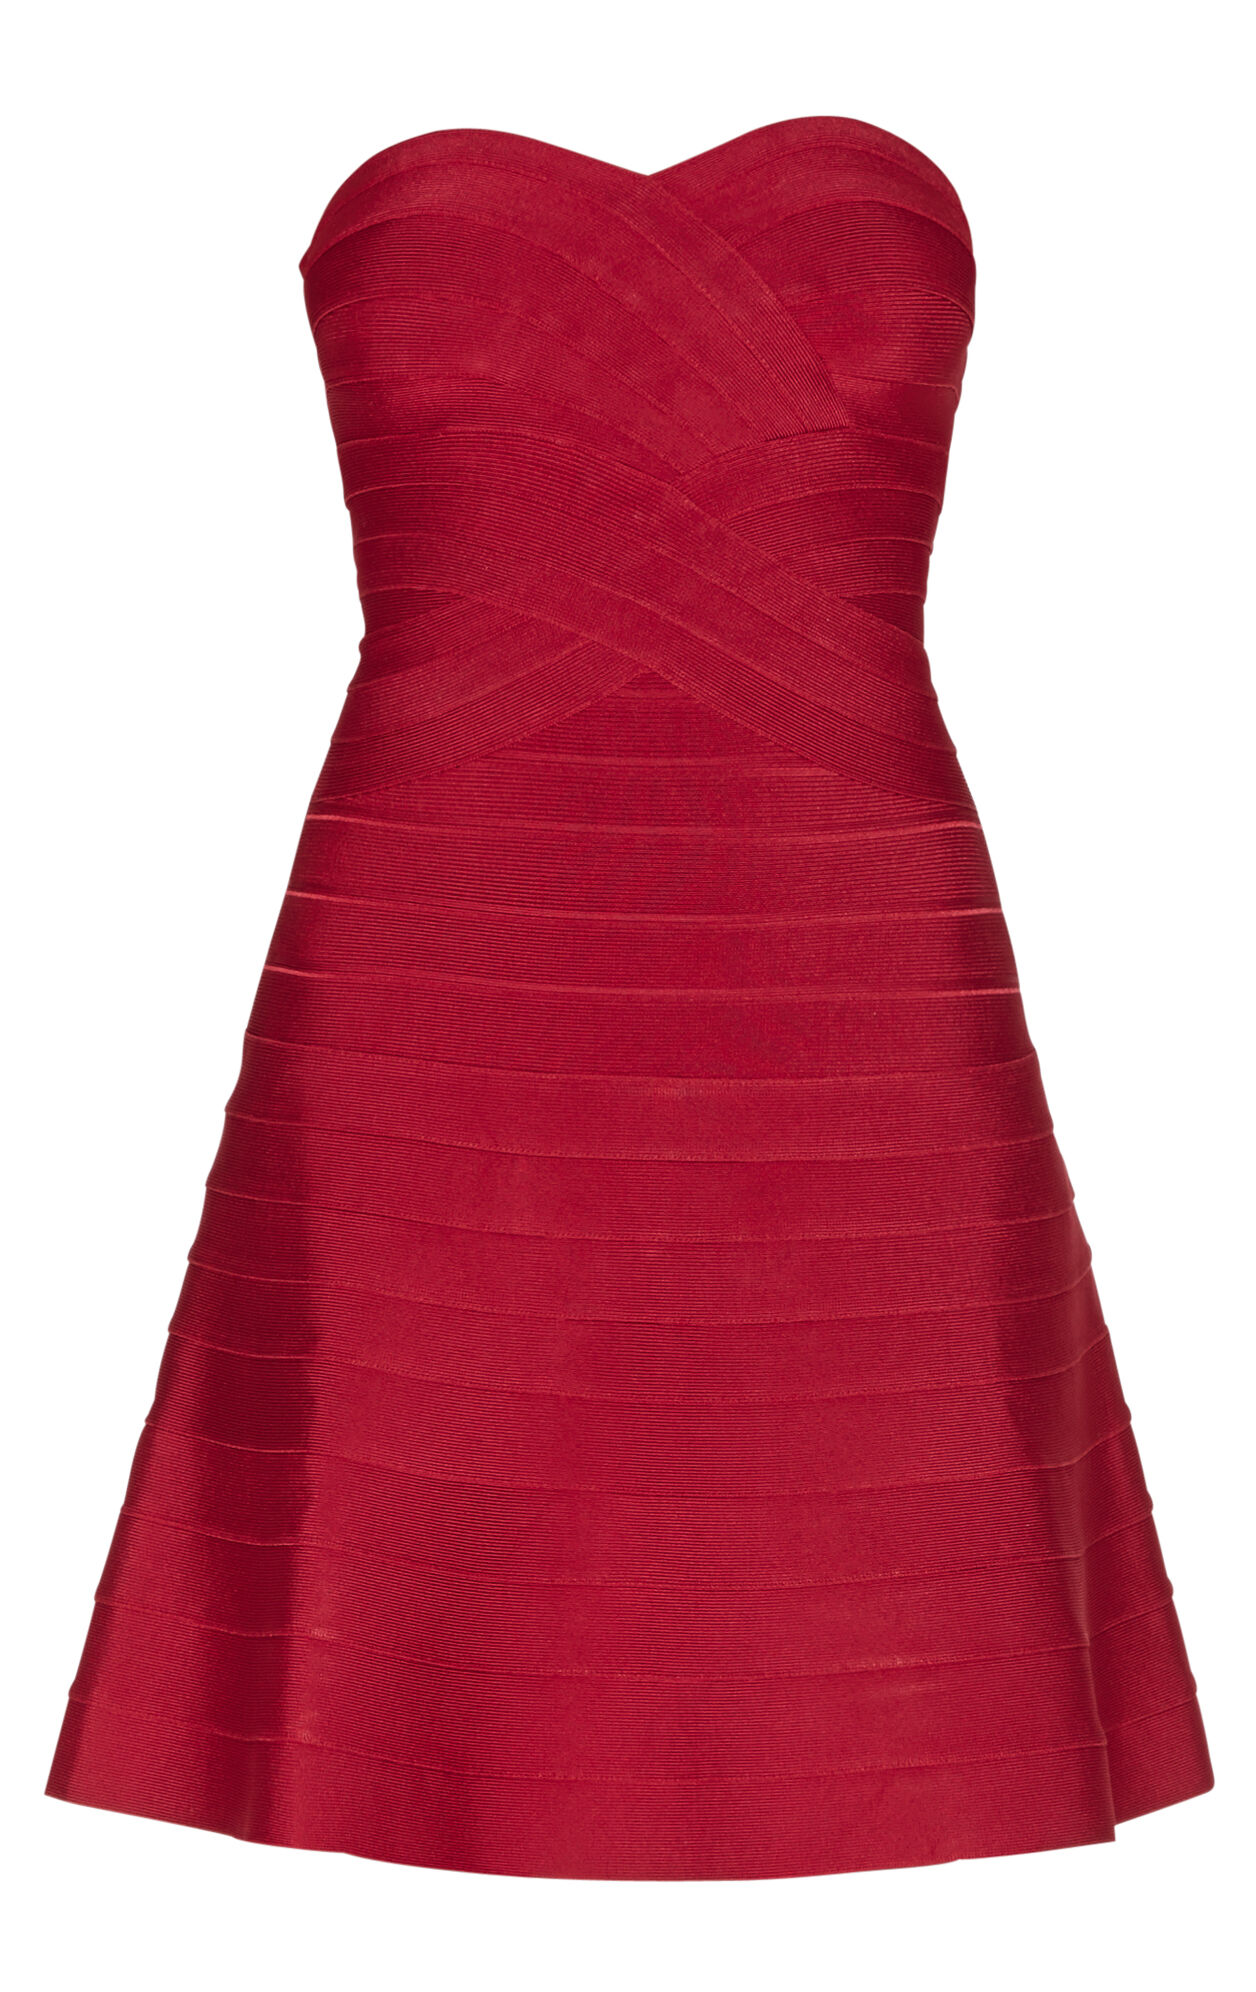 Autumn Novelty Essentials Bandage Dress